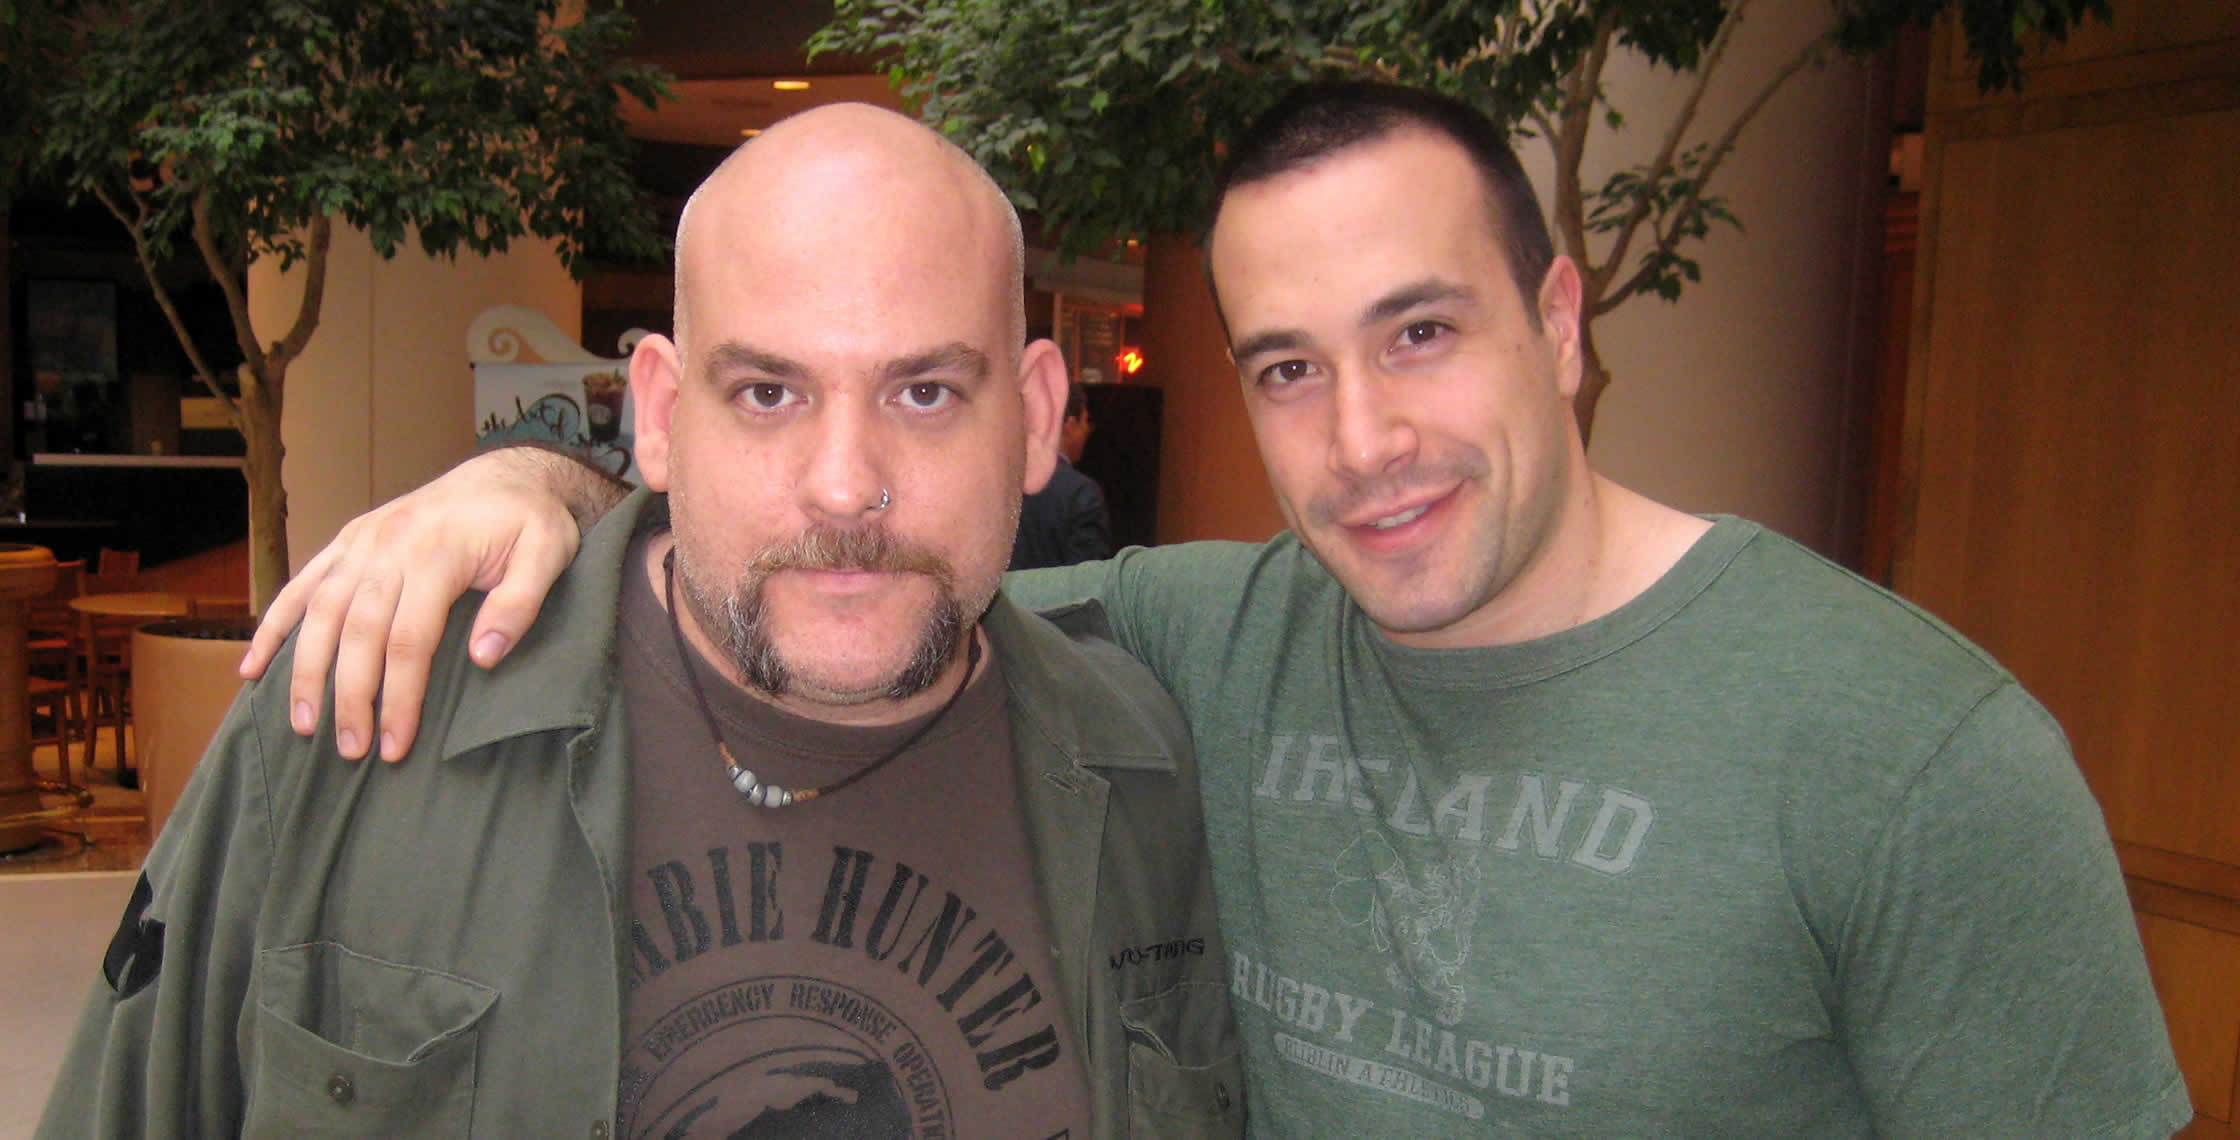 Ben Nadel at CFUNITED 2008 (Washington, D.C.) with: Mark Drew